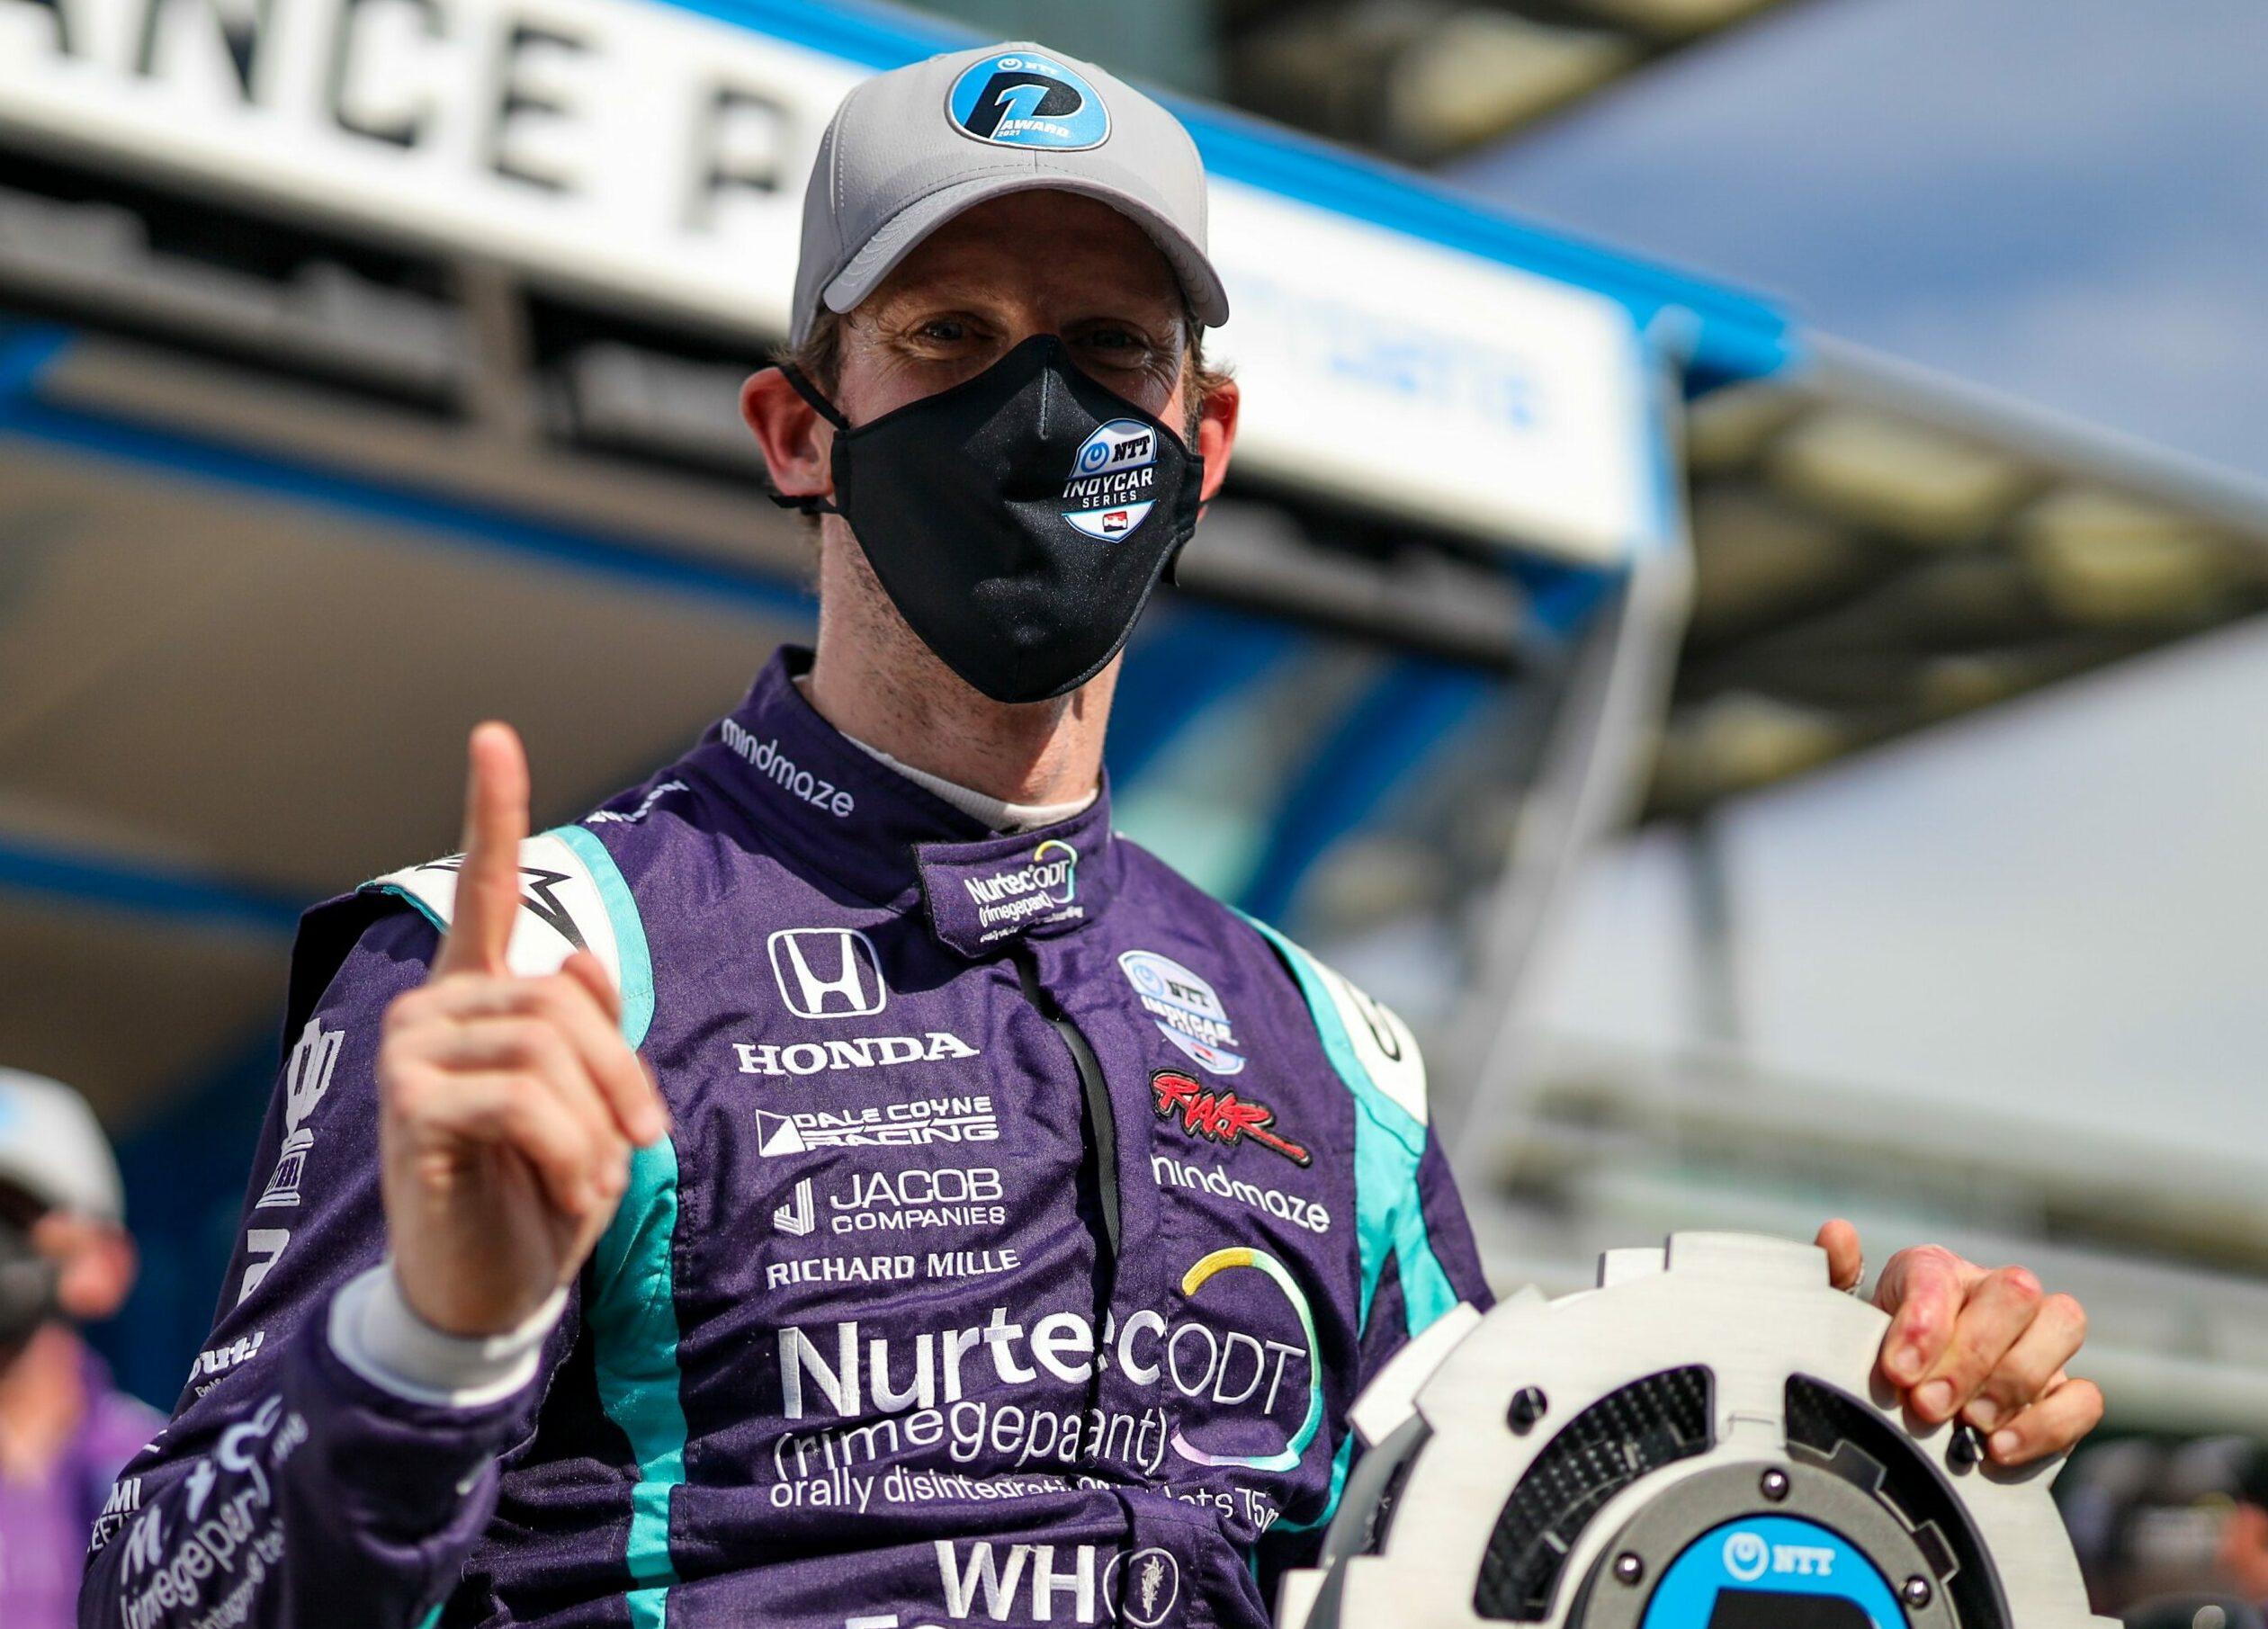 F1 - Romain Grosjean décroche sa première pole position en Indycar